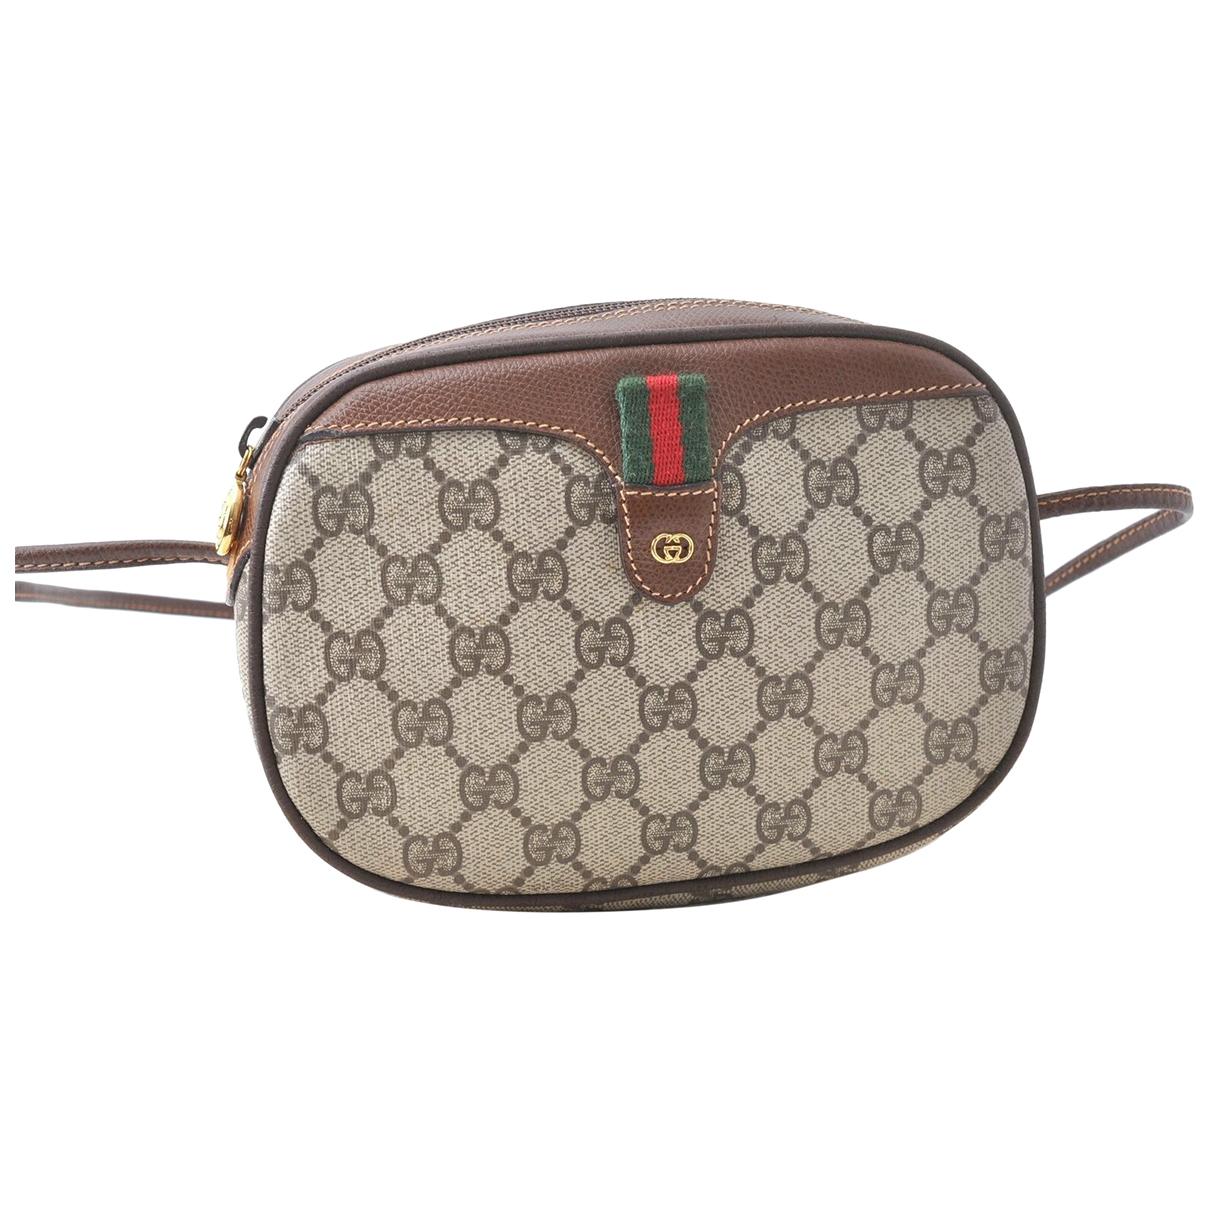 Gucci N Brown handbag for Women N